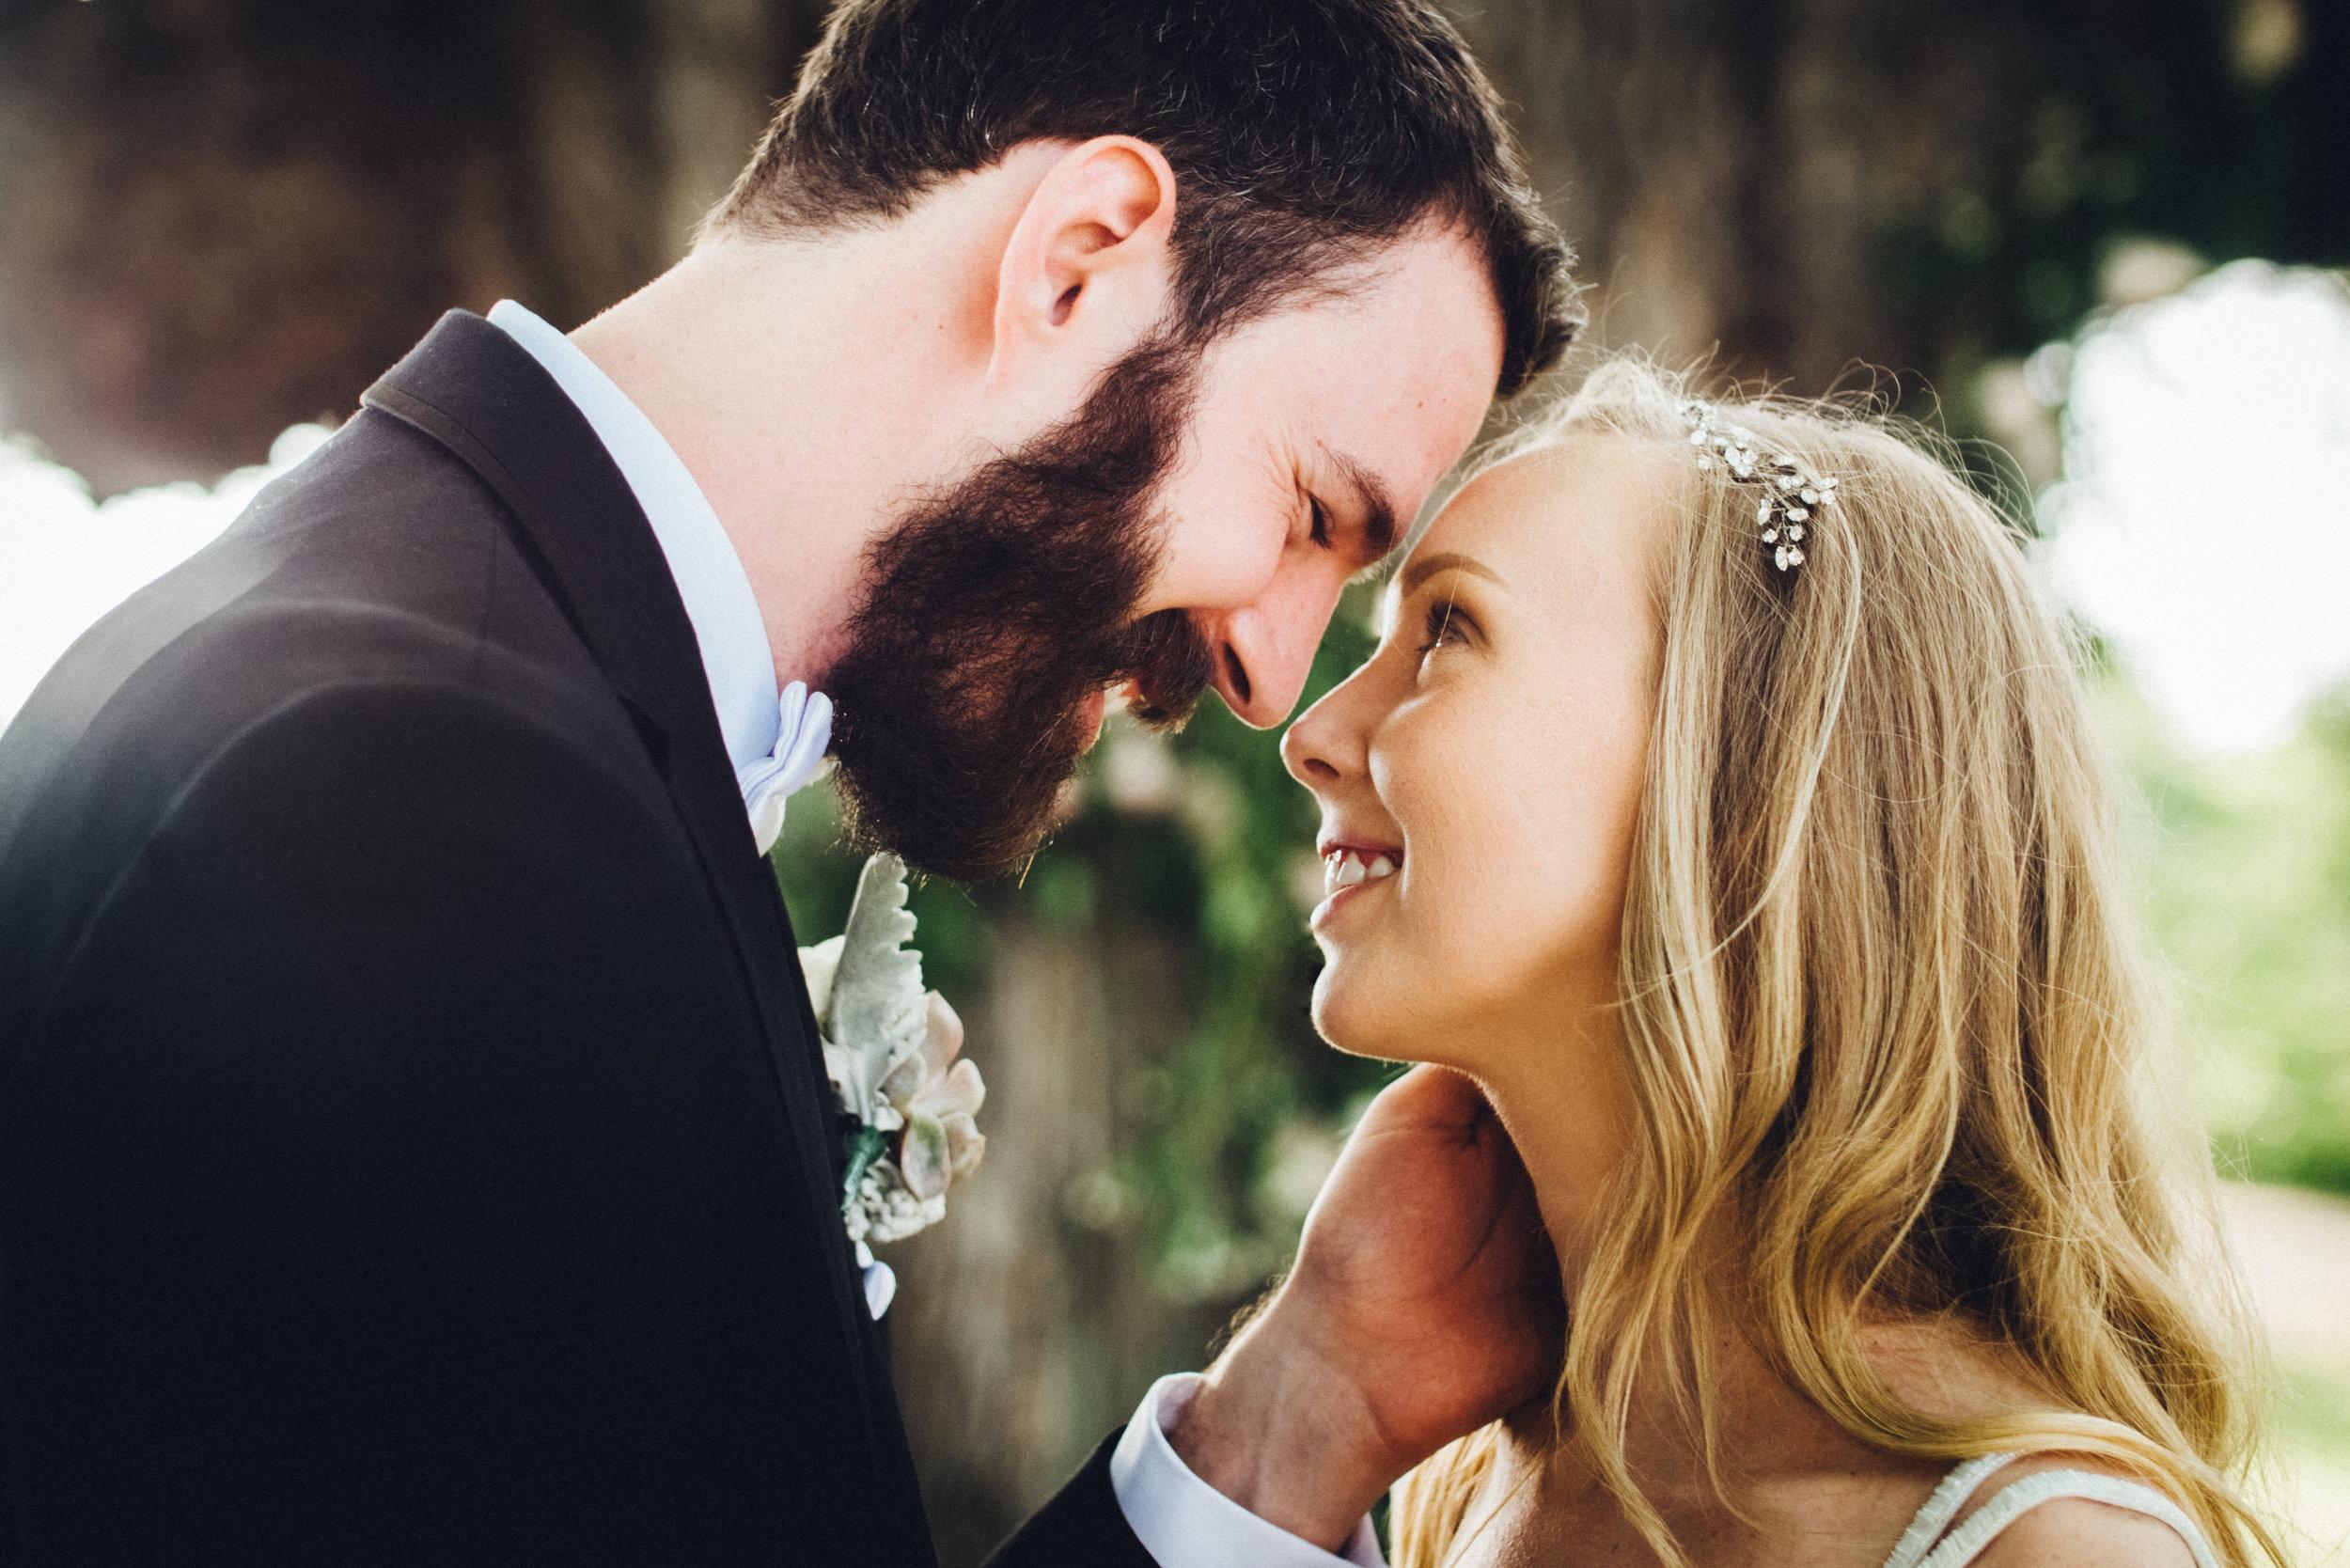 chicago-wedding-jessica-david-ledwidge-film-video-photos-michigan-award-winning-photography-videography-cinematographery